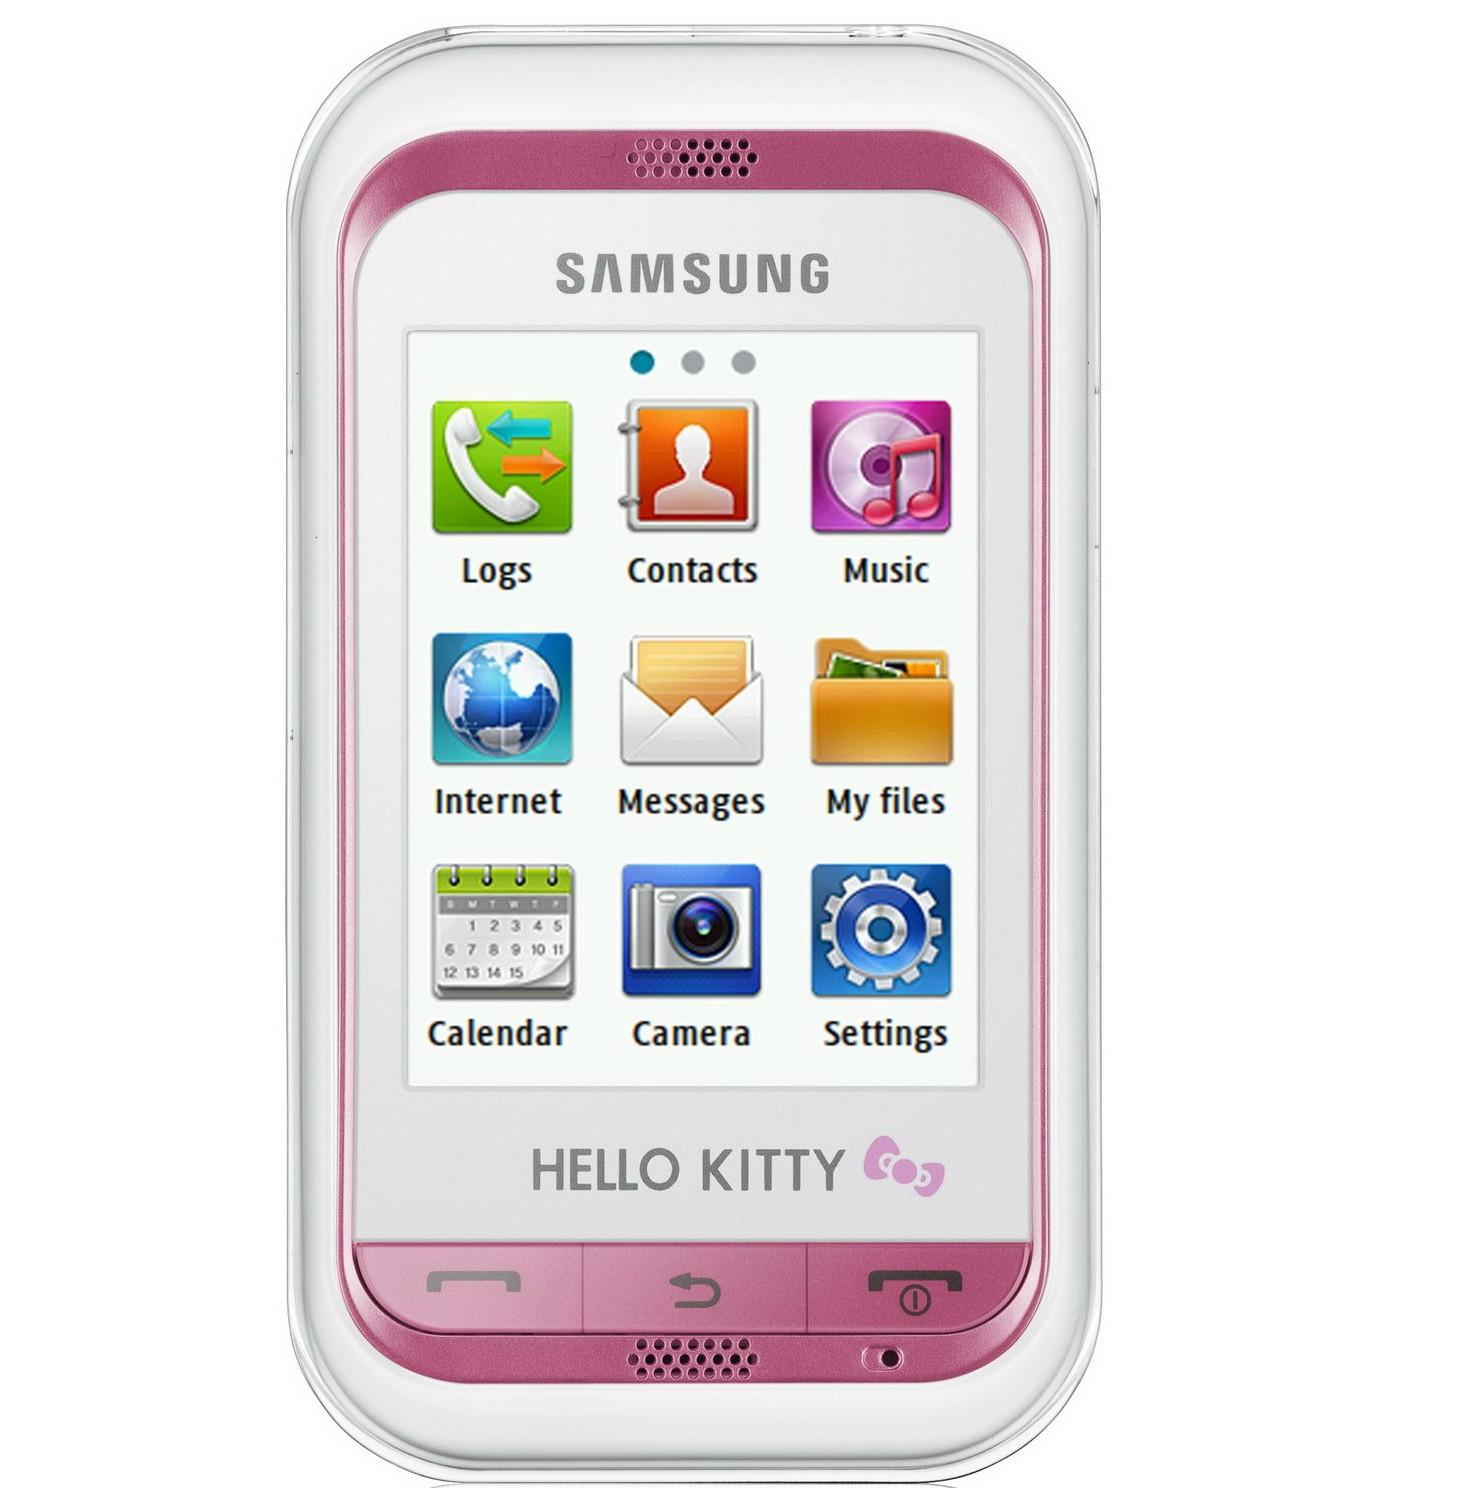 http://3.bp.blogspot.com/-kxG4zcbsU2s/Tte06uWPgVI/AAAAAAAALD8/5yoAnKH5oJI/s1600/Samsung%2BC3300%2BHello%2BKitty.jpg